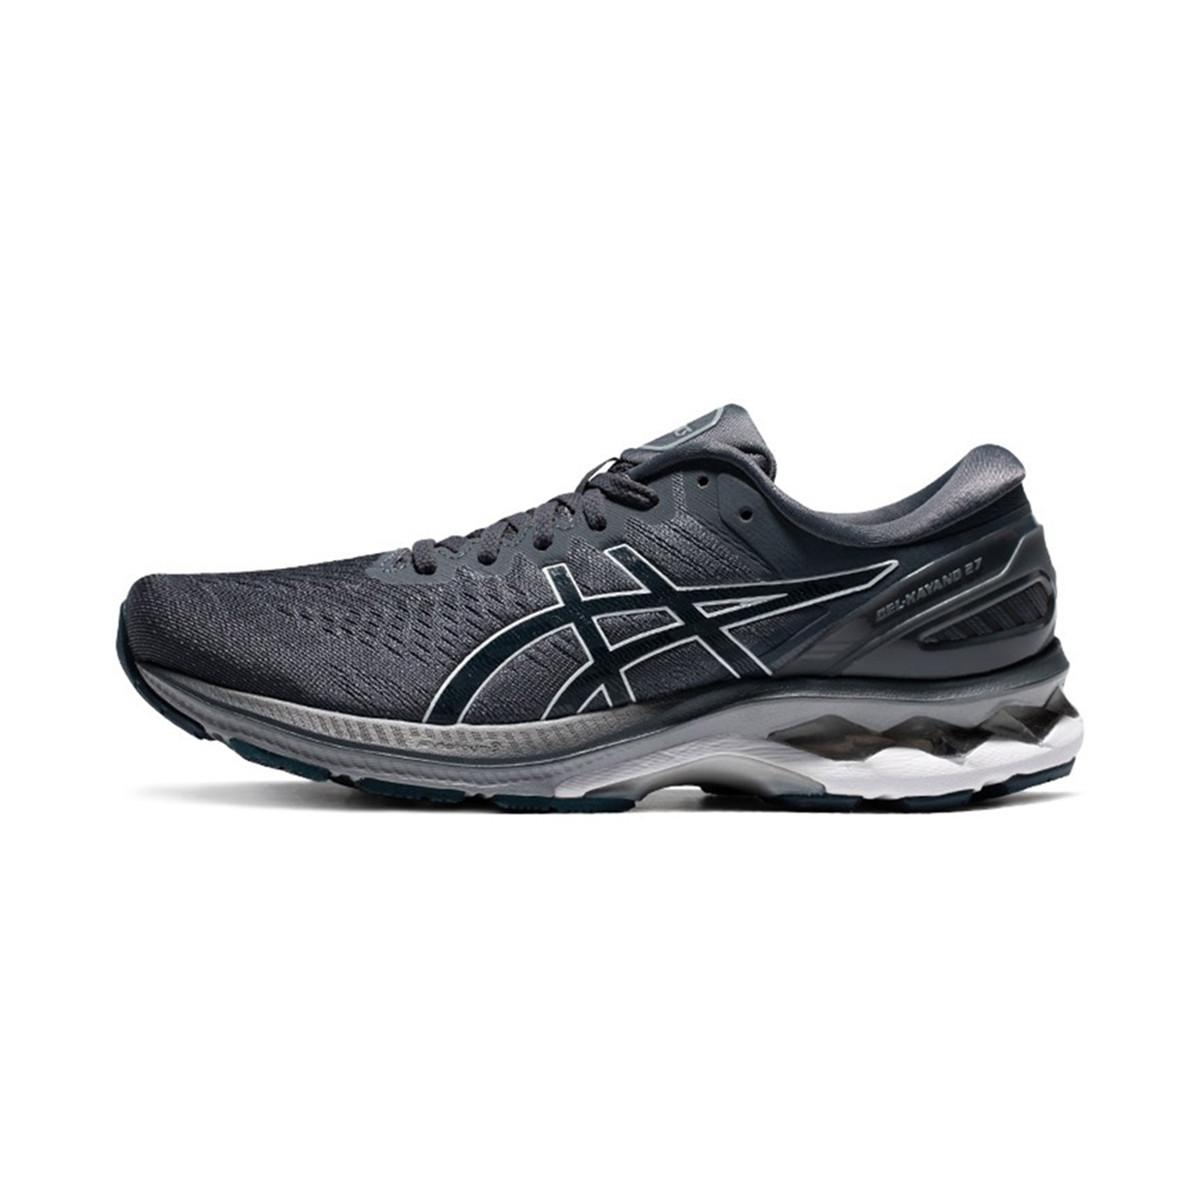 ASICS 亚瑟士 GEL-KAYANO 27 1011A767 男款顶级支撑跑鞋